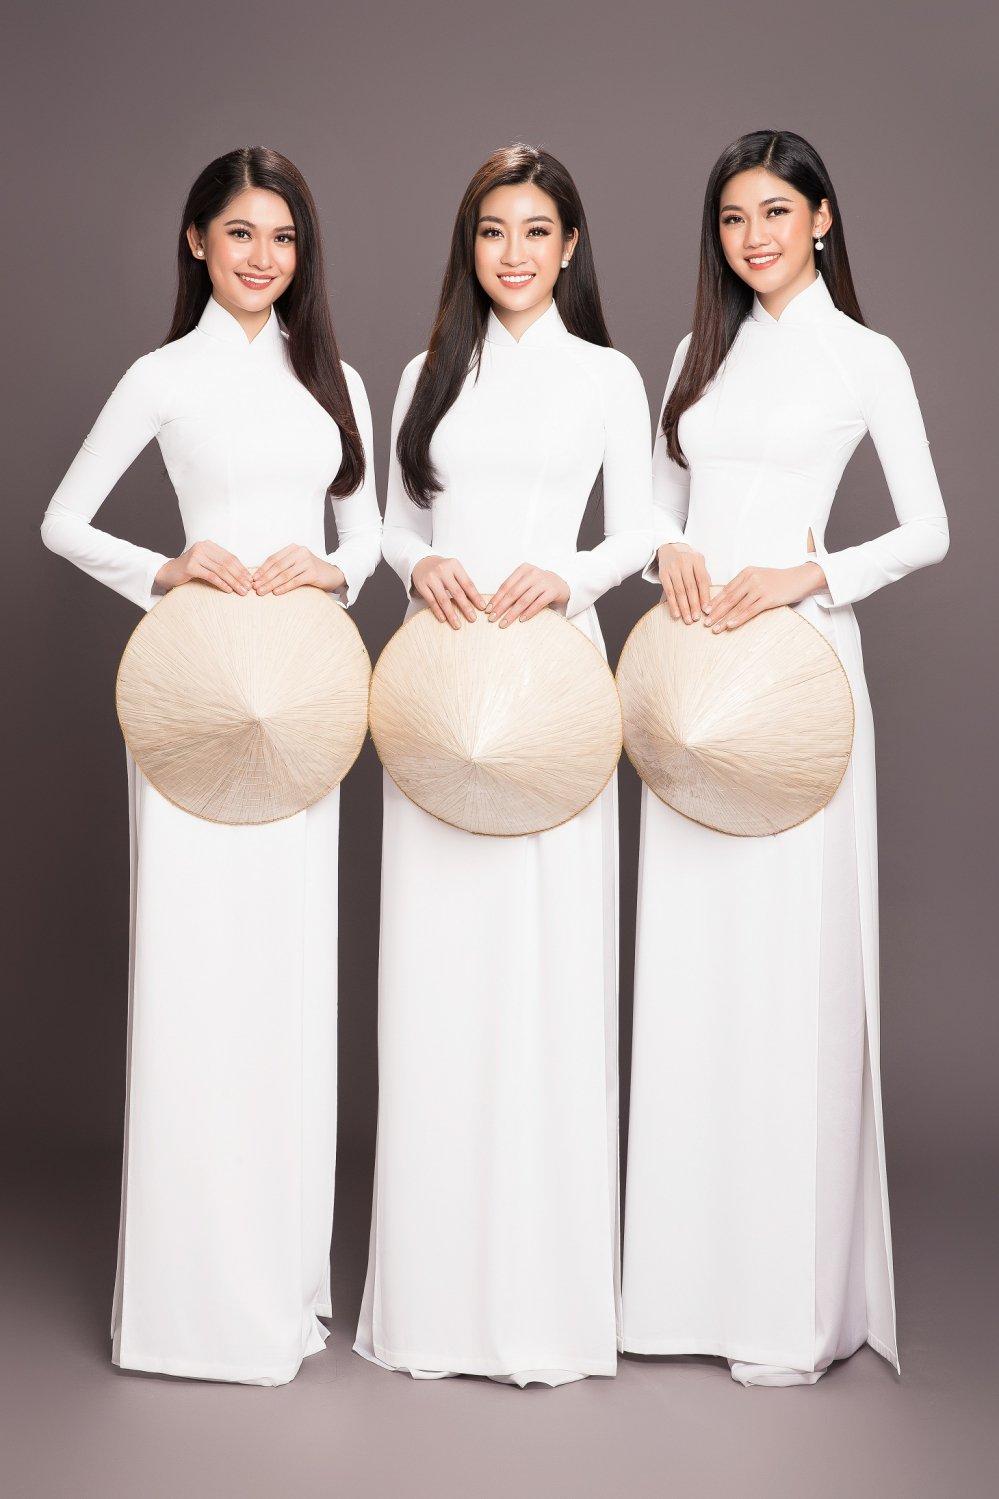 Top 3 Hoa hau Viet Nam 2016 dien ao dai trang khoe sac rang ro truoc khi het nhiem ky hinh anh 2